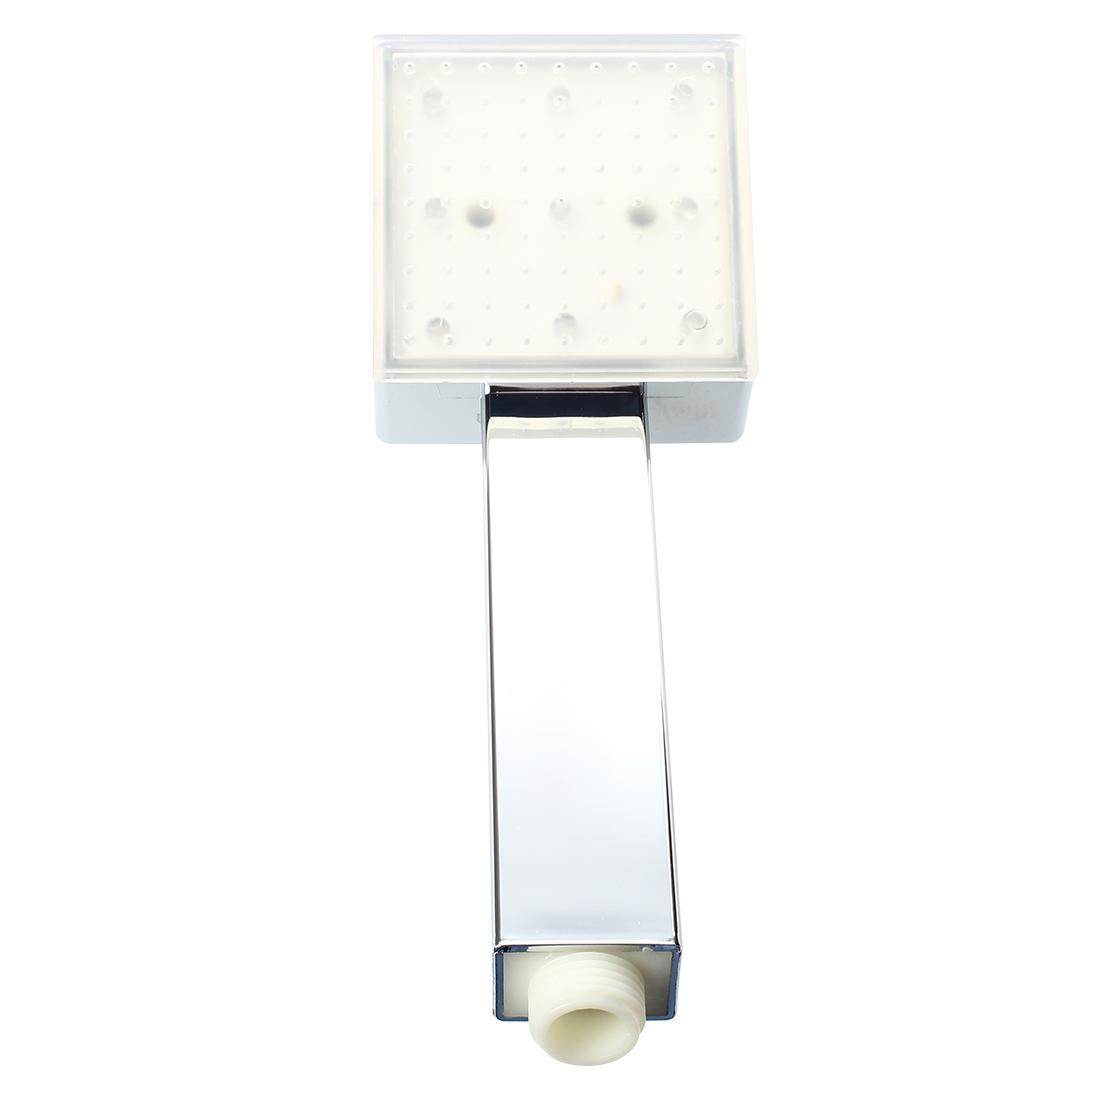 led duschkopf duschbrause brausekopf handbrause farbwechsel verchromt de ebay. Black Bedroom Furniture Sets. Home Design Ideas